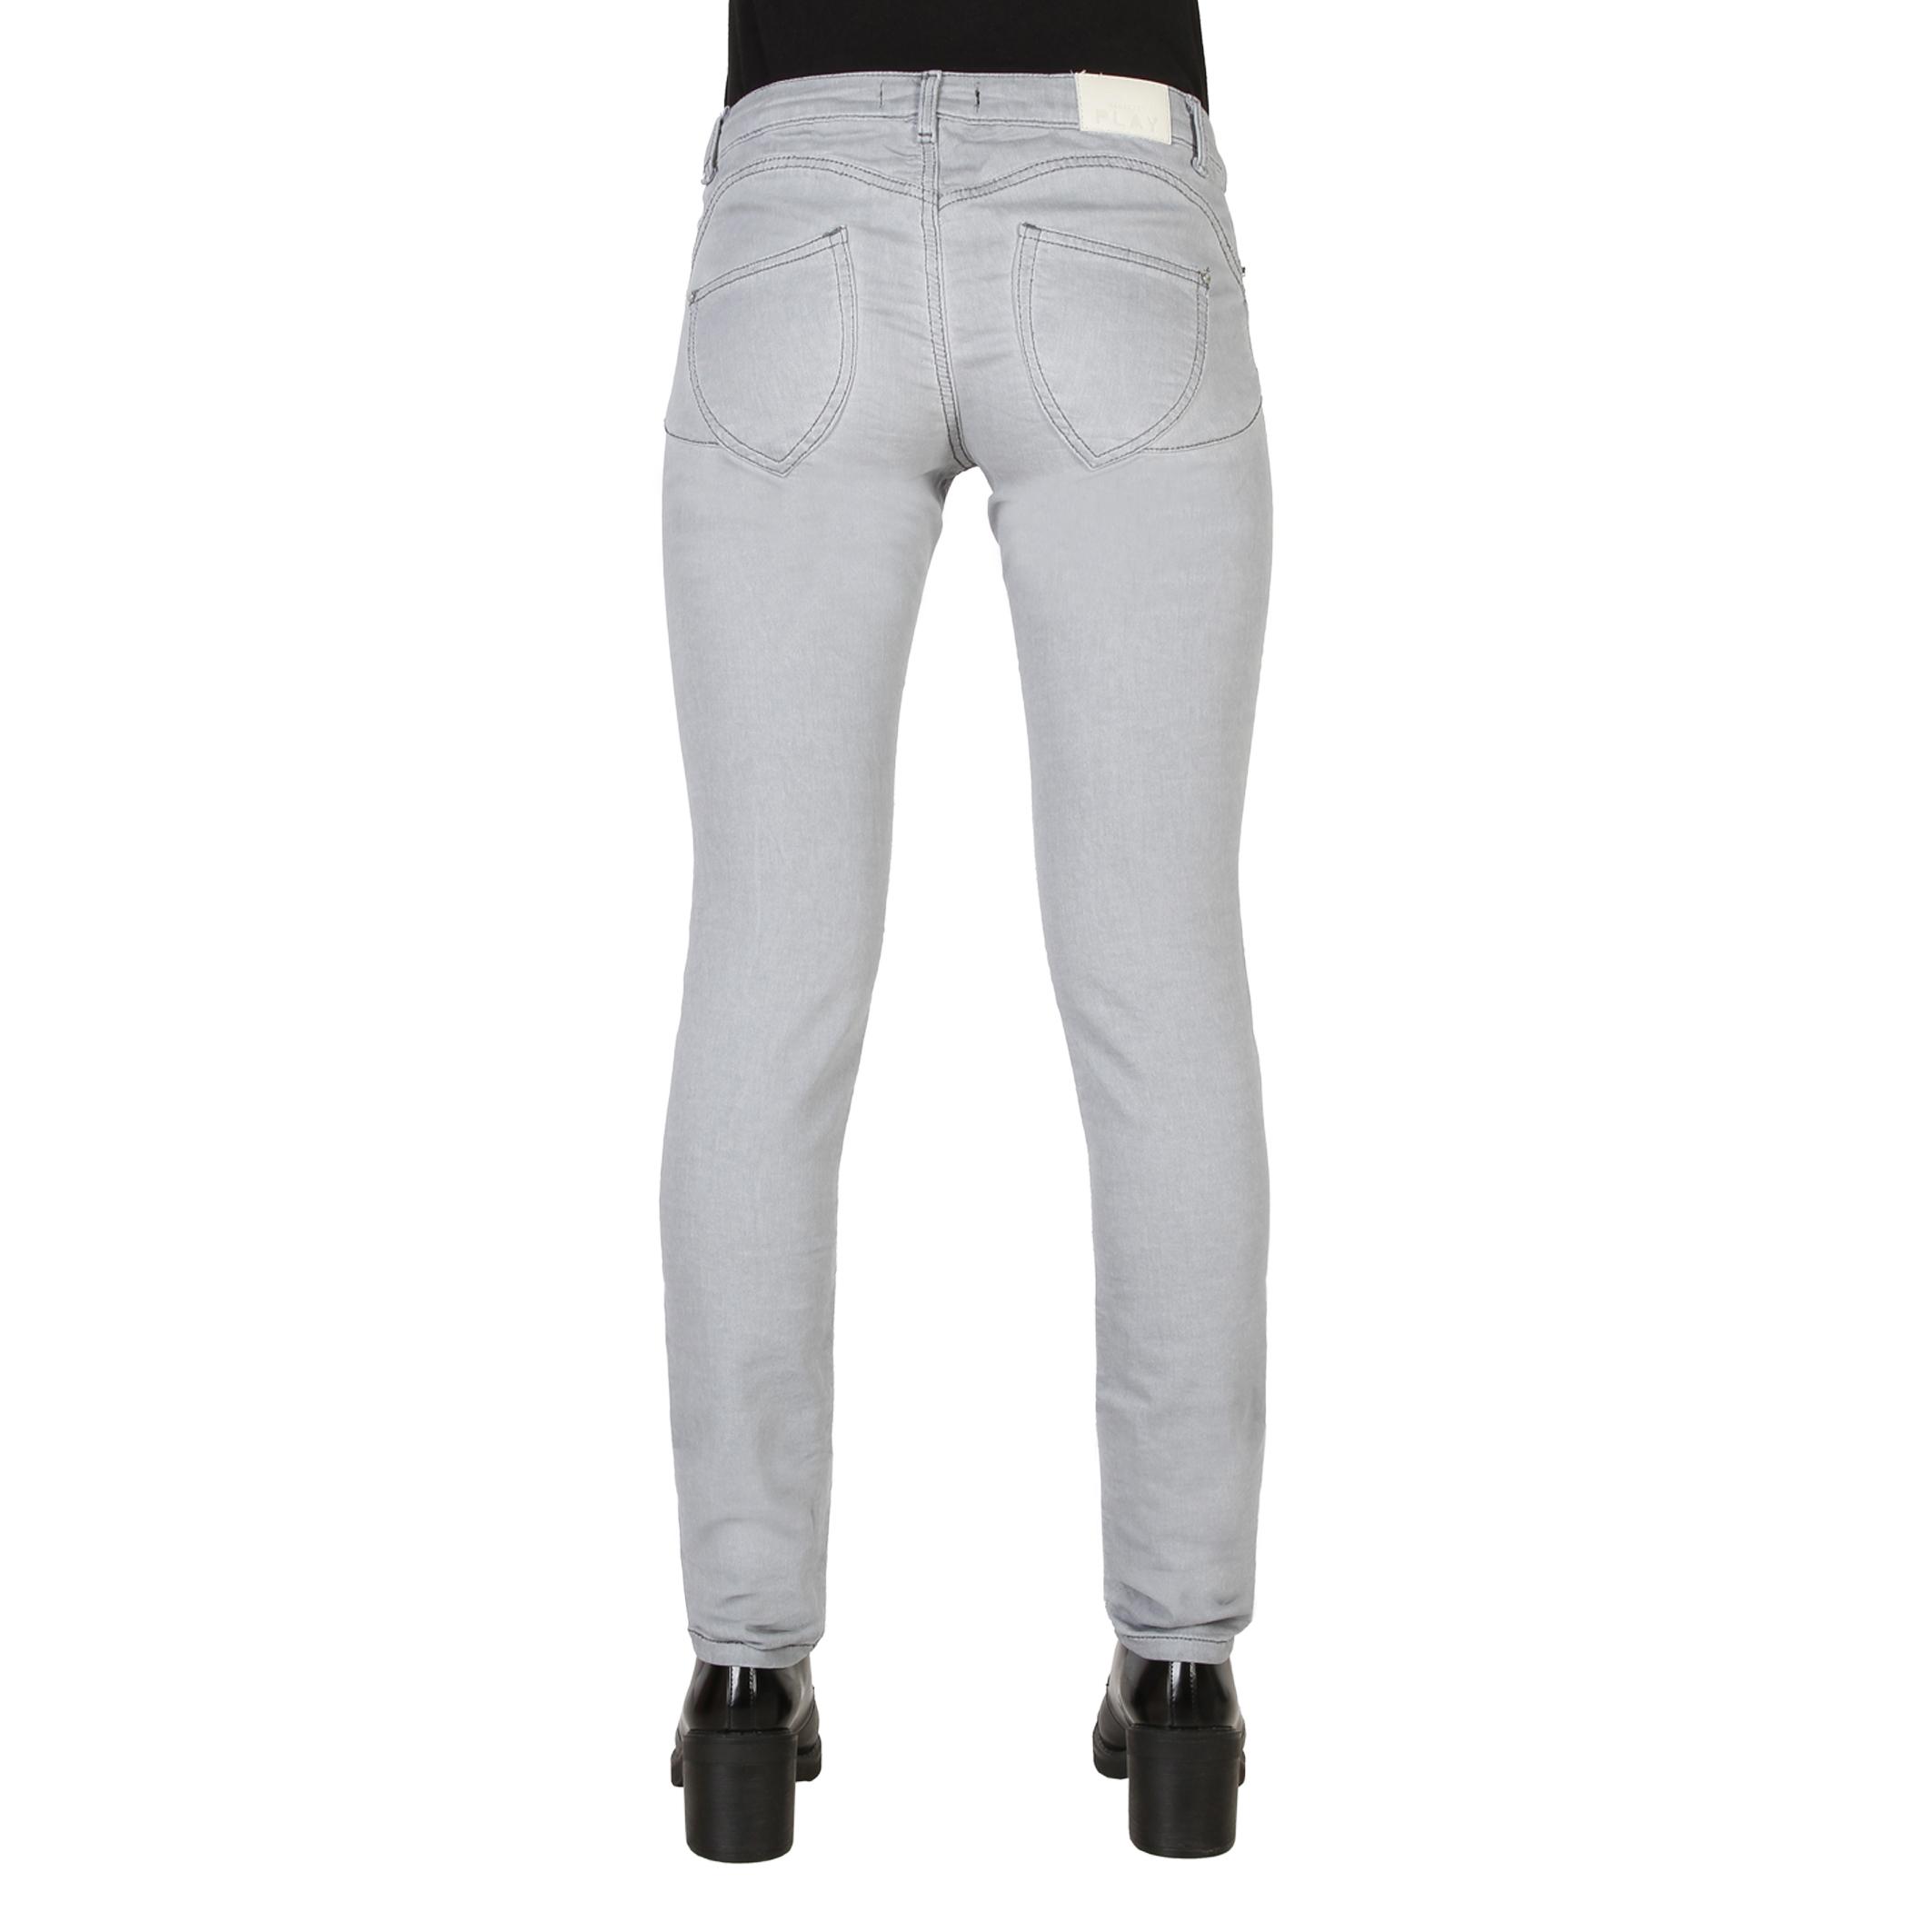 Jeans   Carrera Jeans 000788_0980A grey